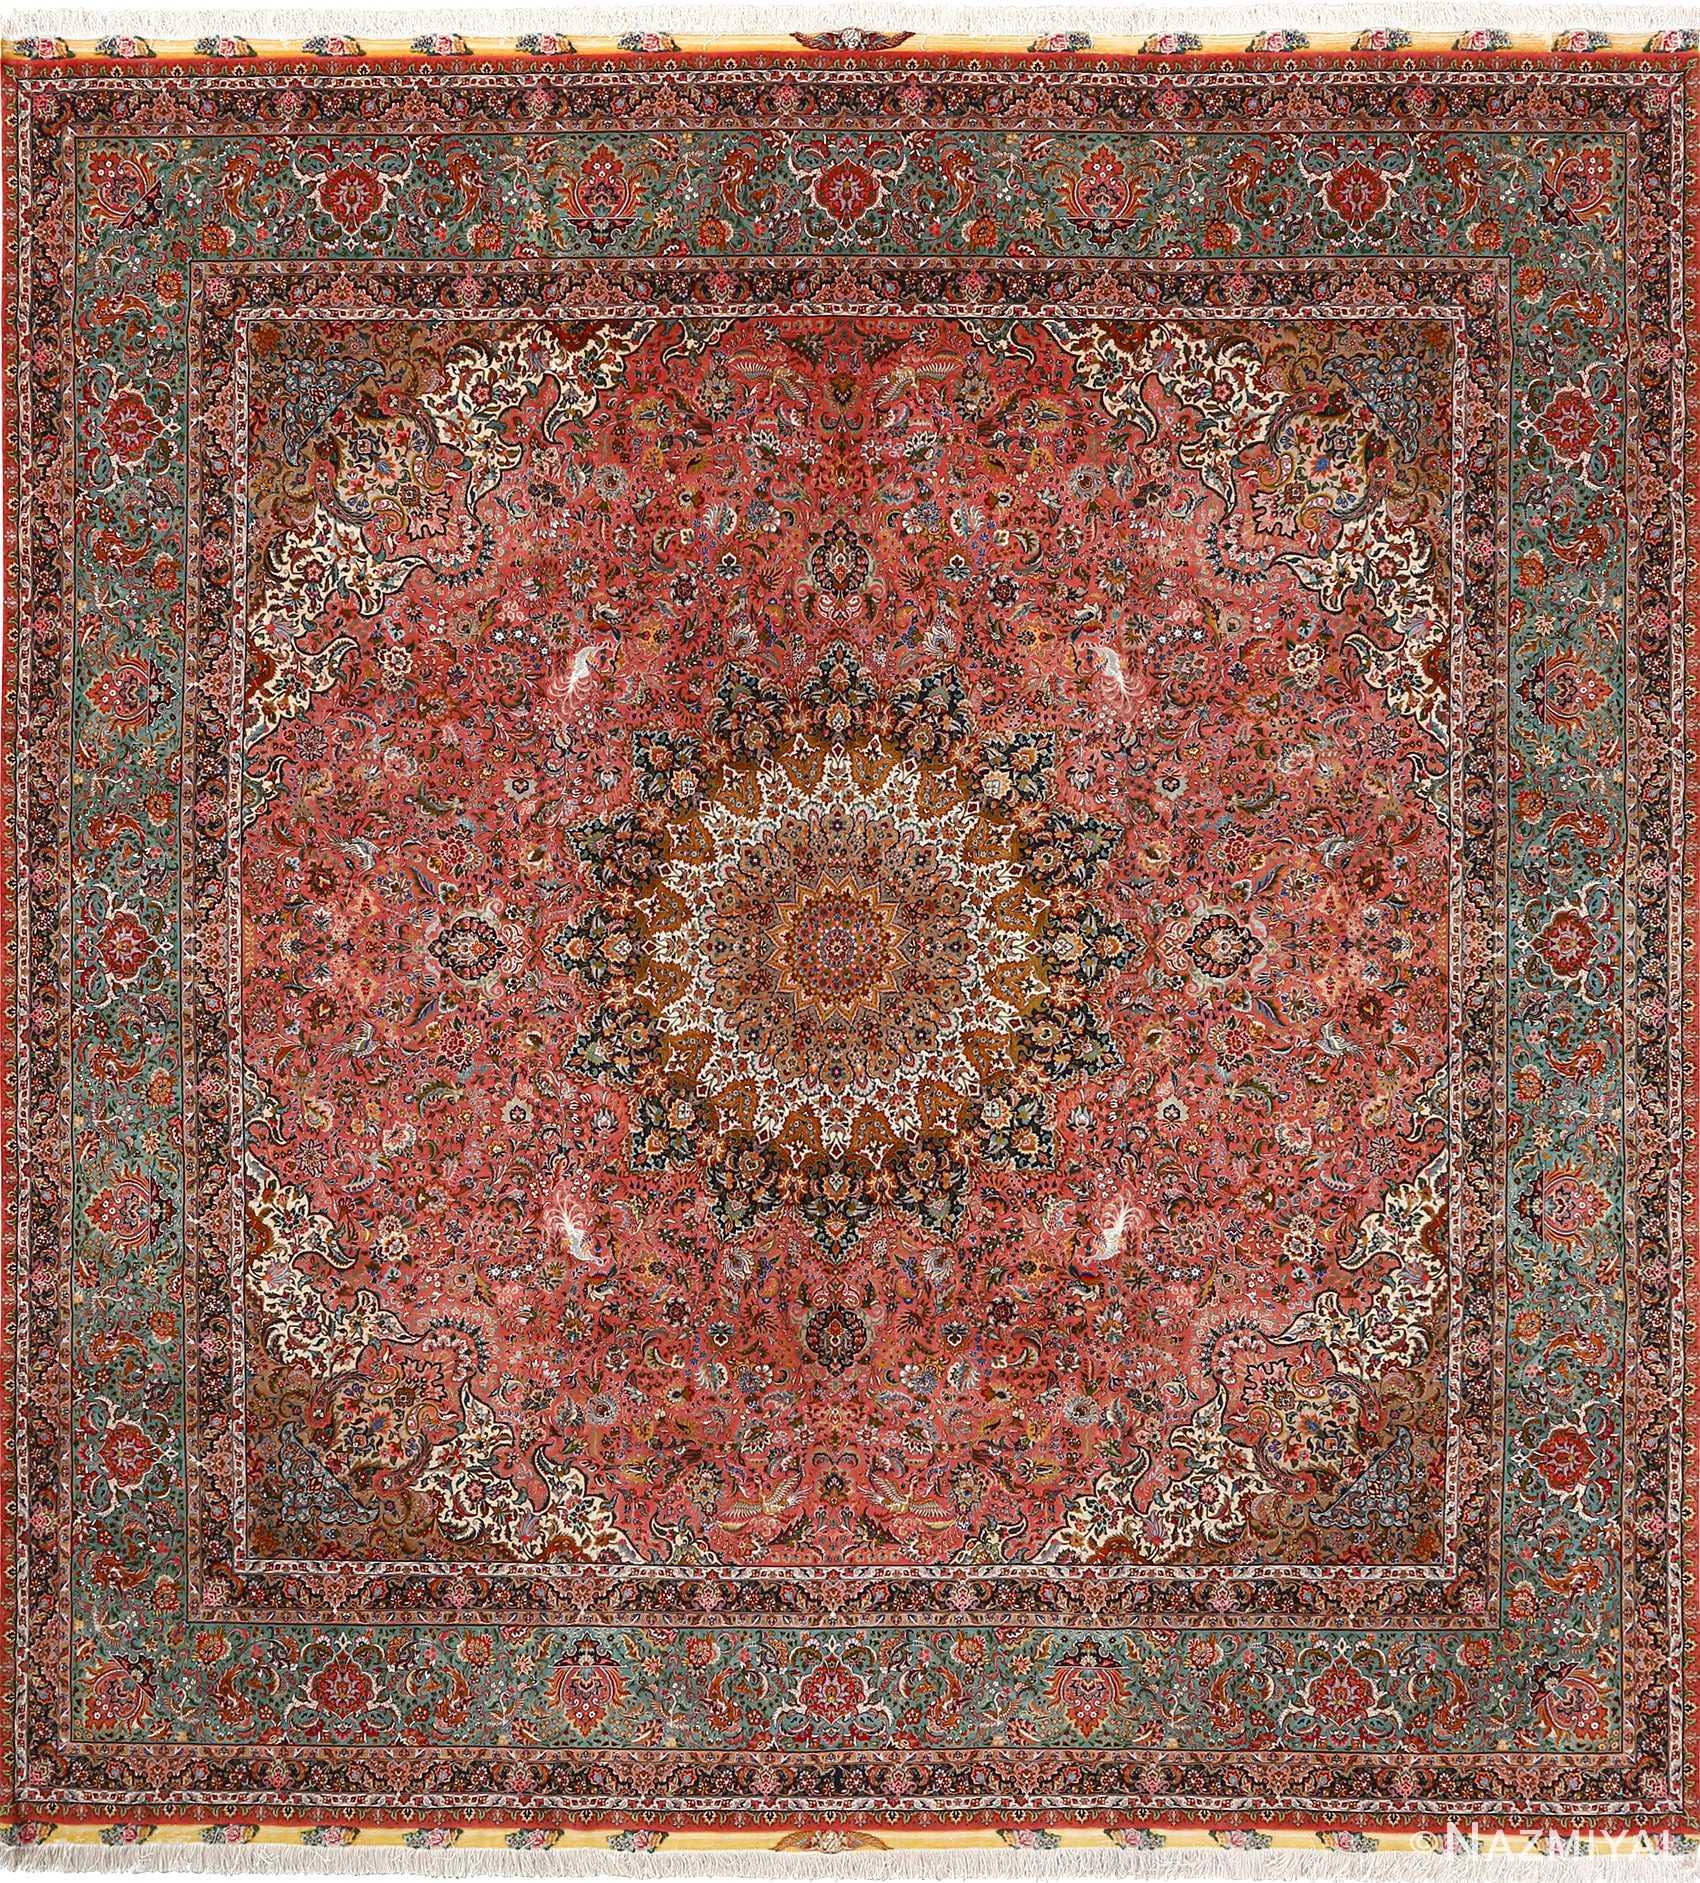 Modern Persian Tabriz Design Rug 44687 Nazmiyal Antique Rugs: Square Animal Motif Vintage Tabriz Persian Rug 51080 By